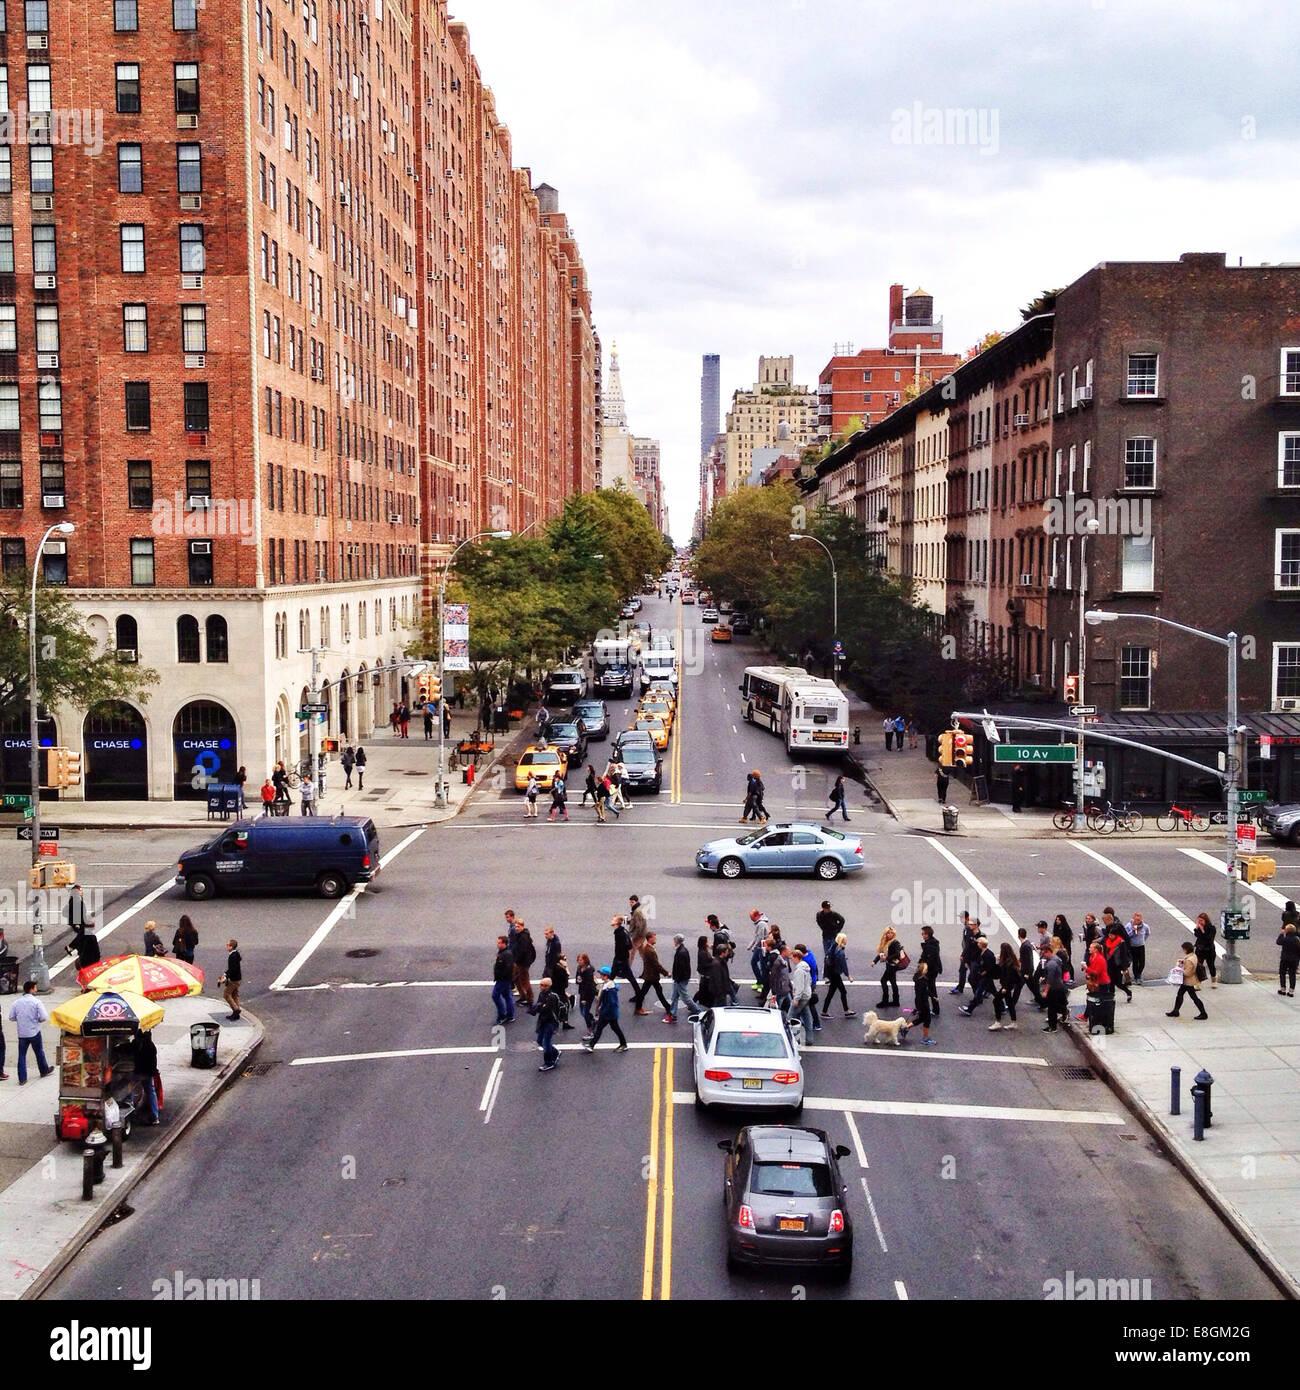 USA, New York City, people crossing street - Stock Image